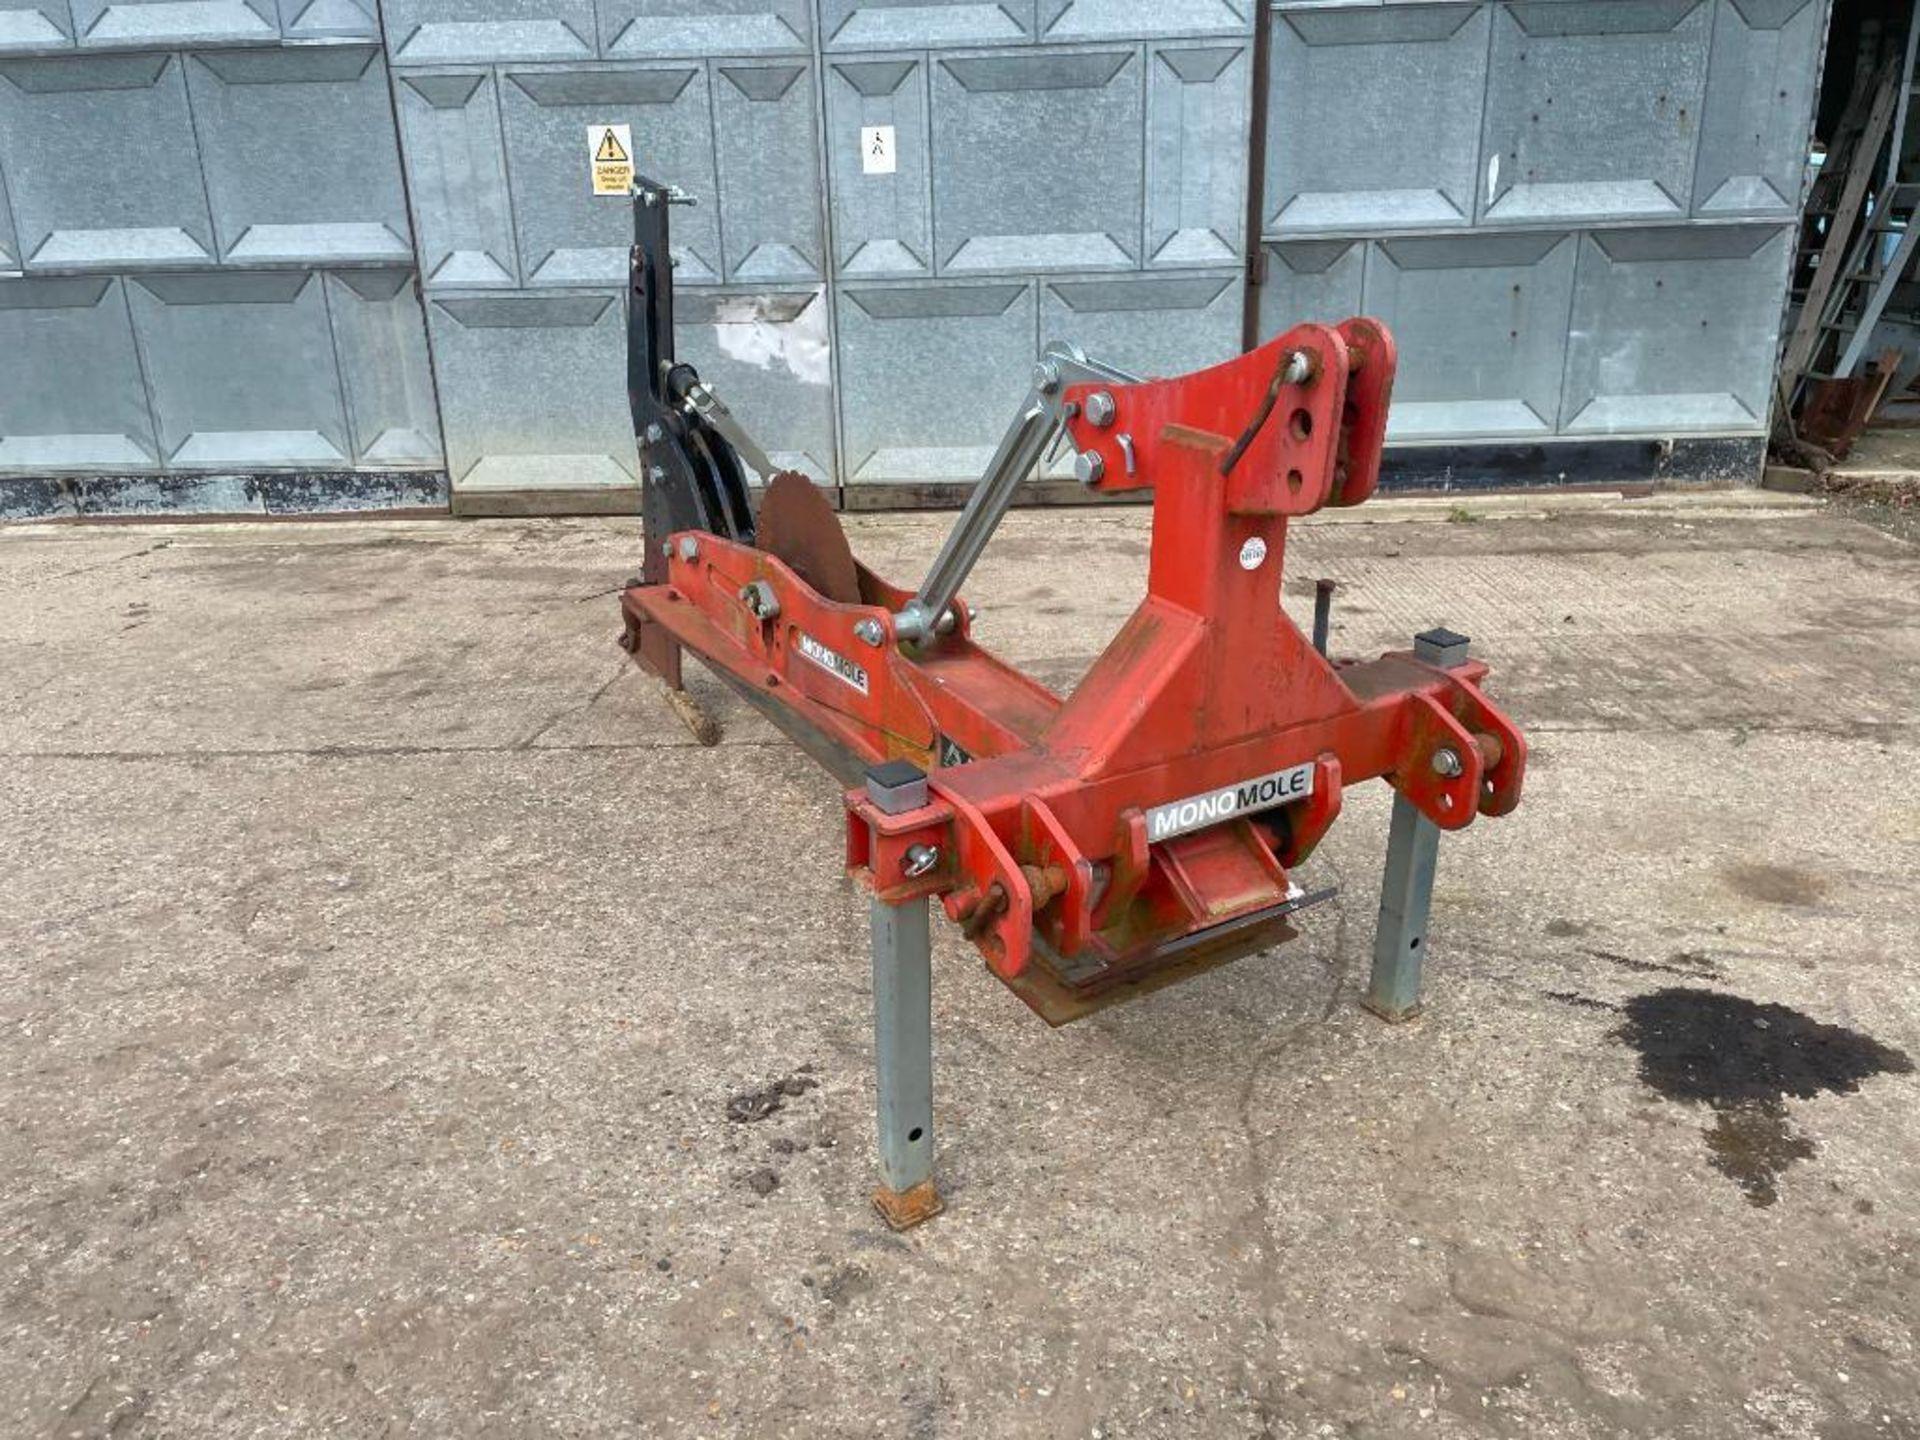 2013 Proforge Monomole single leg mole drainer. Serial No: 32757 - Image 3 of 8